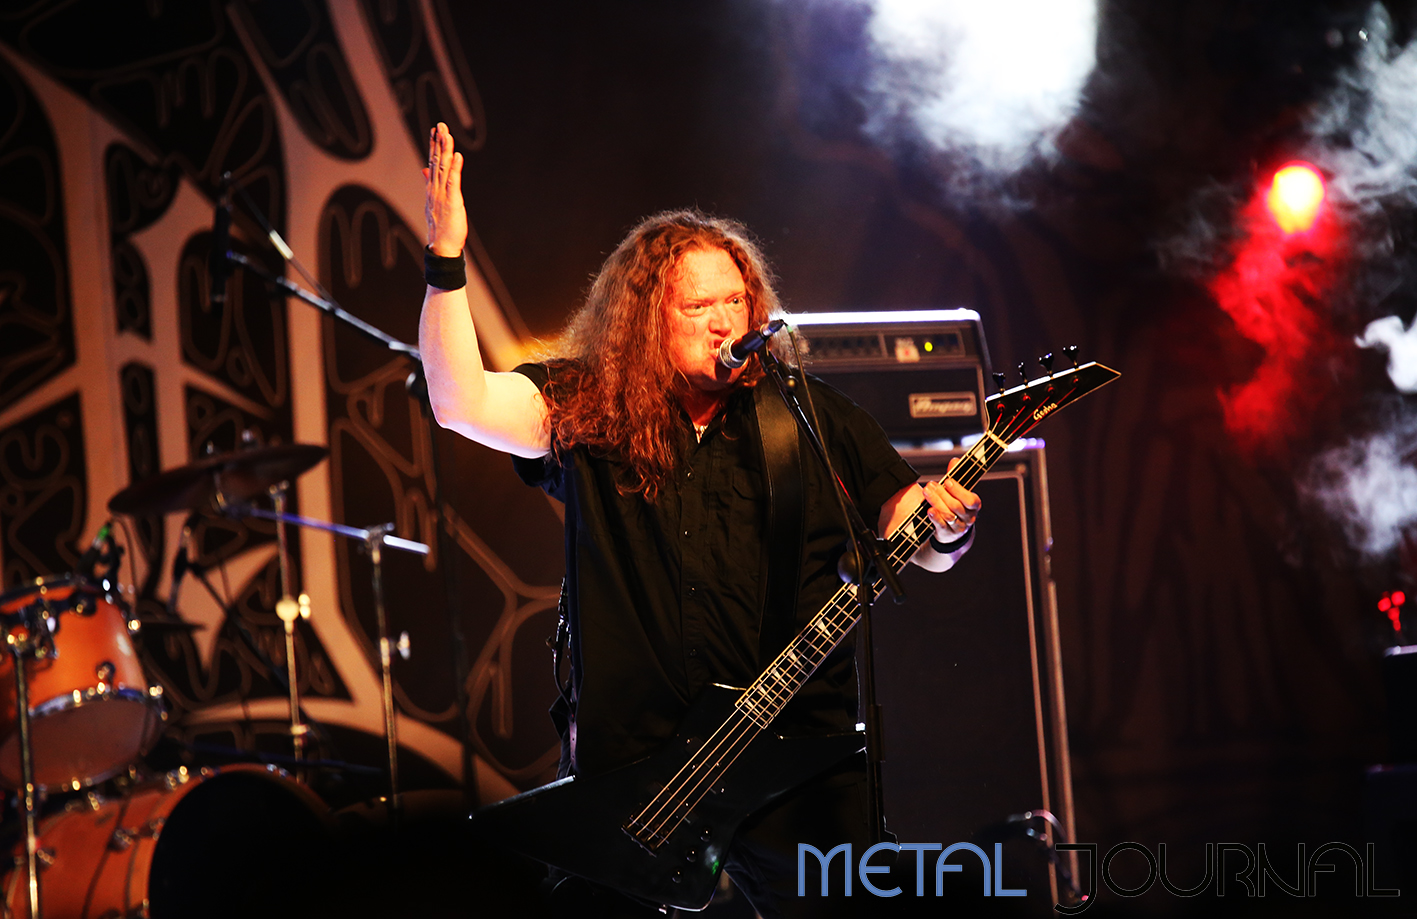 unleashed - leyendas del rock 2019 metal journal pic 2